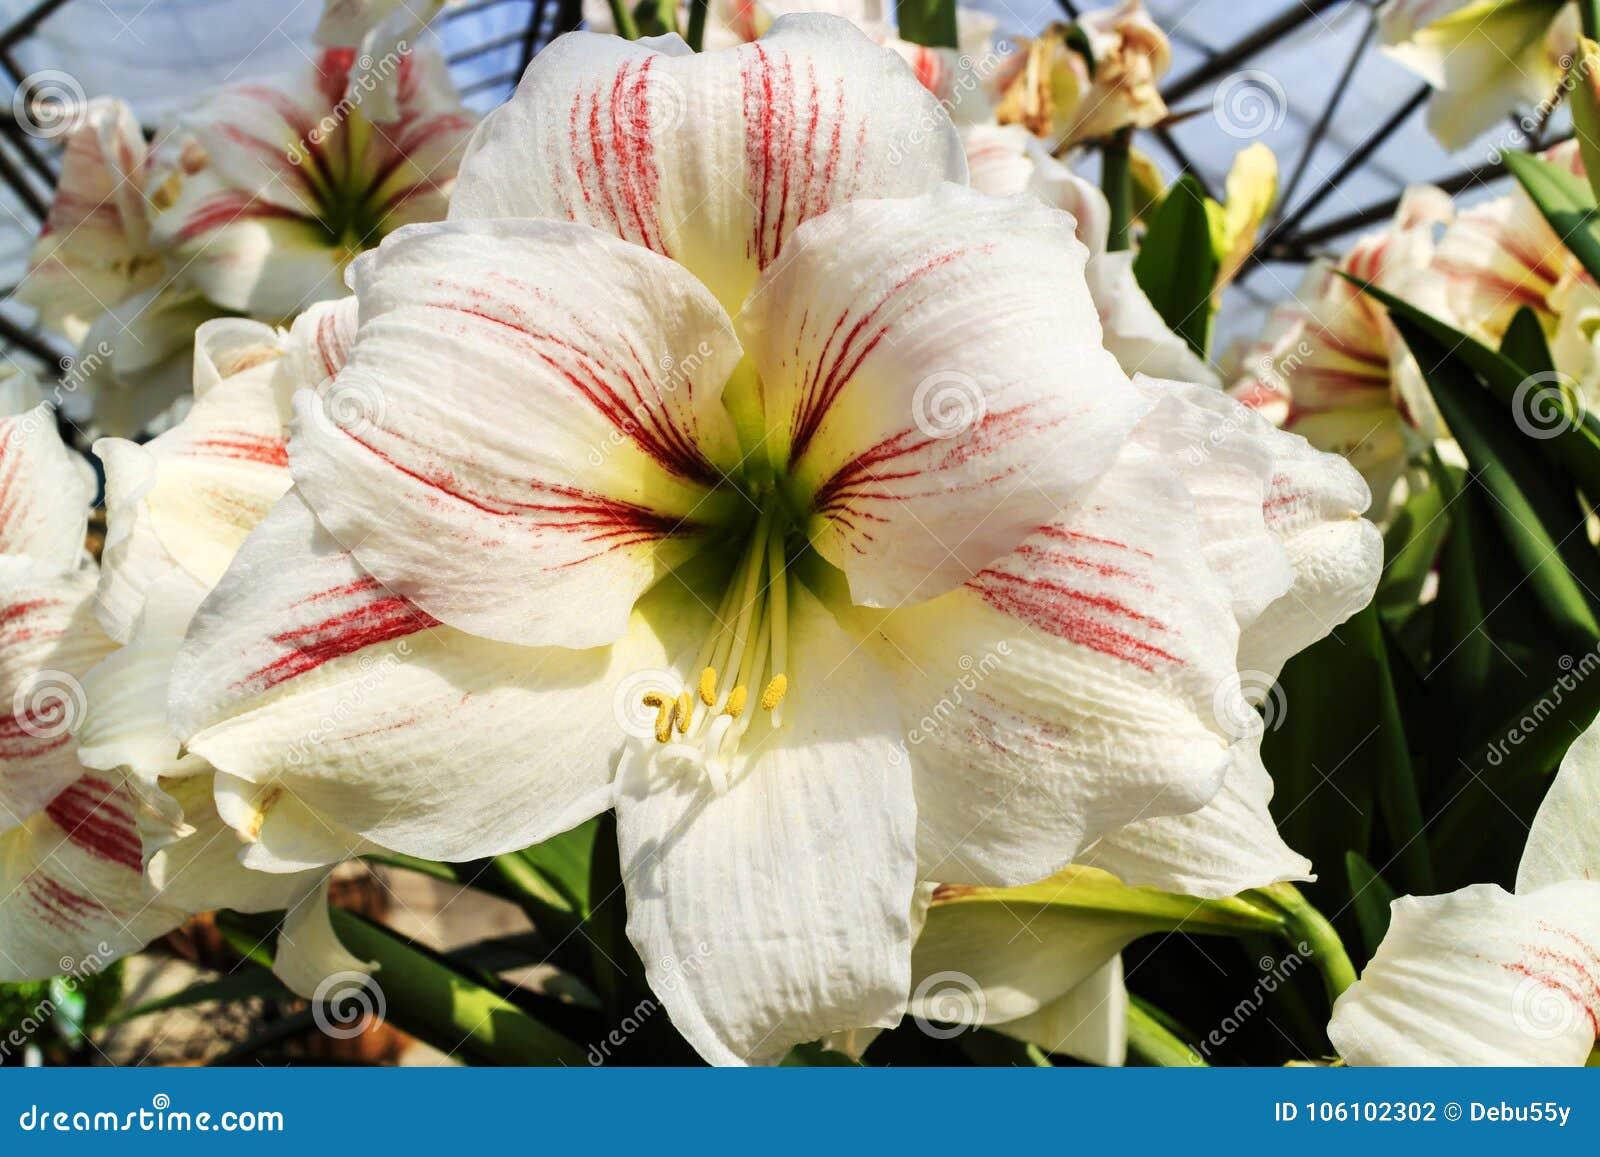 White With Pink Stripes Amaryllis Flower Close Up Stock Photo